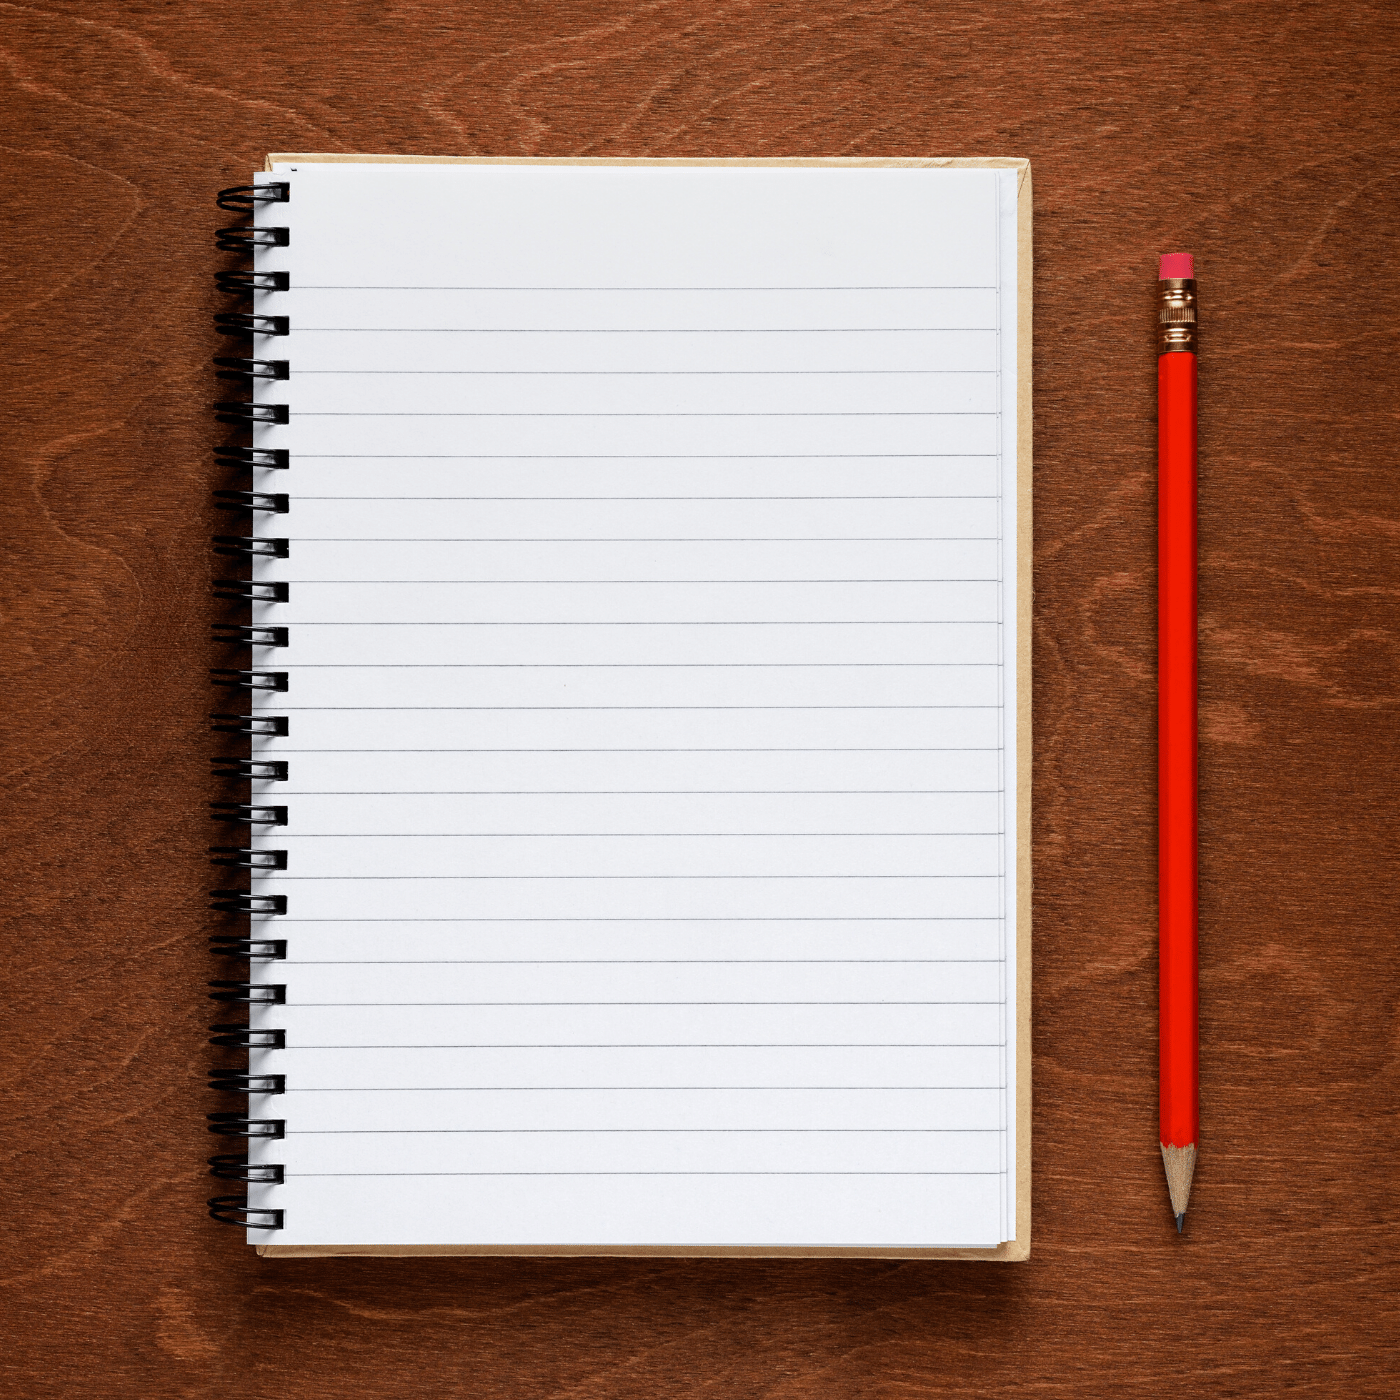 Adding Journaling and Removing Sugar Equals Success Image